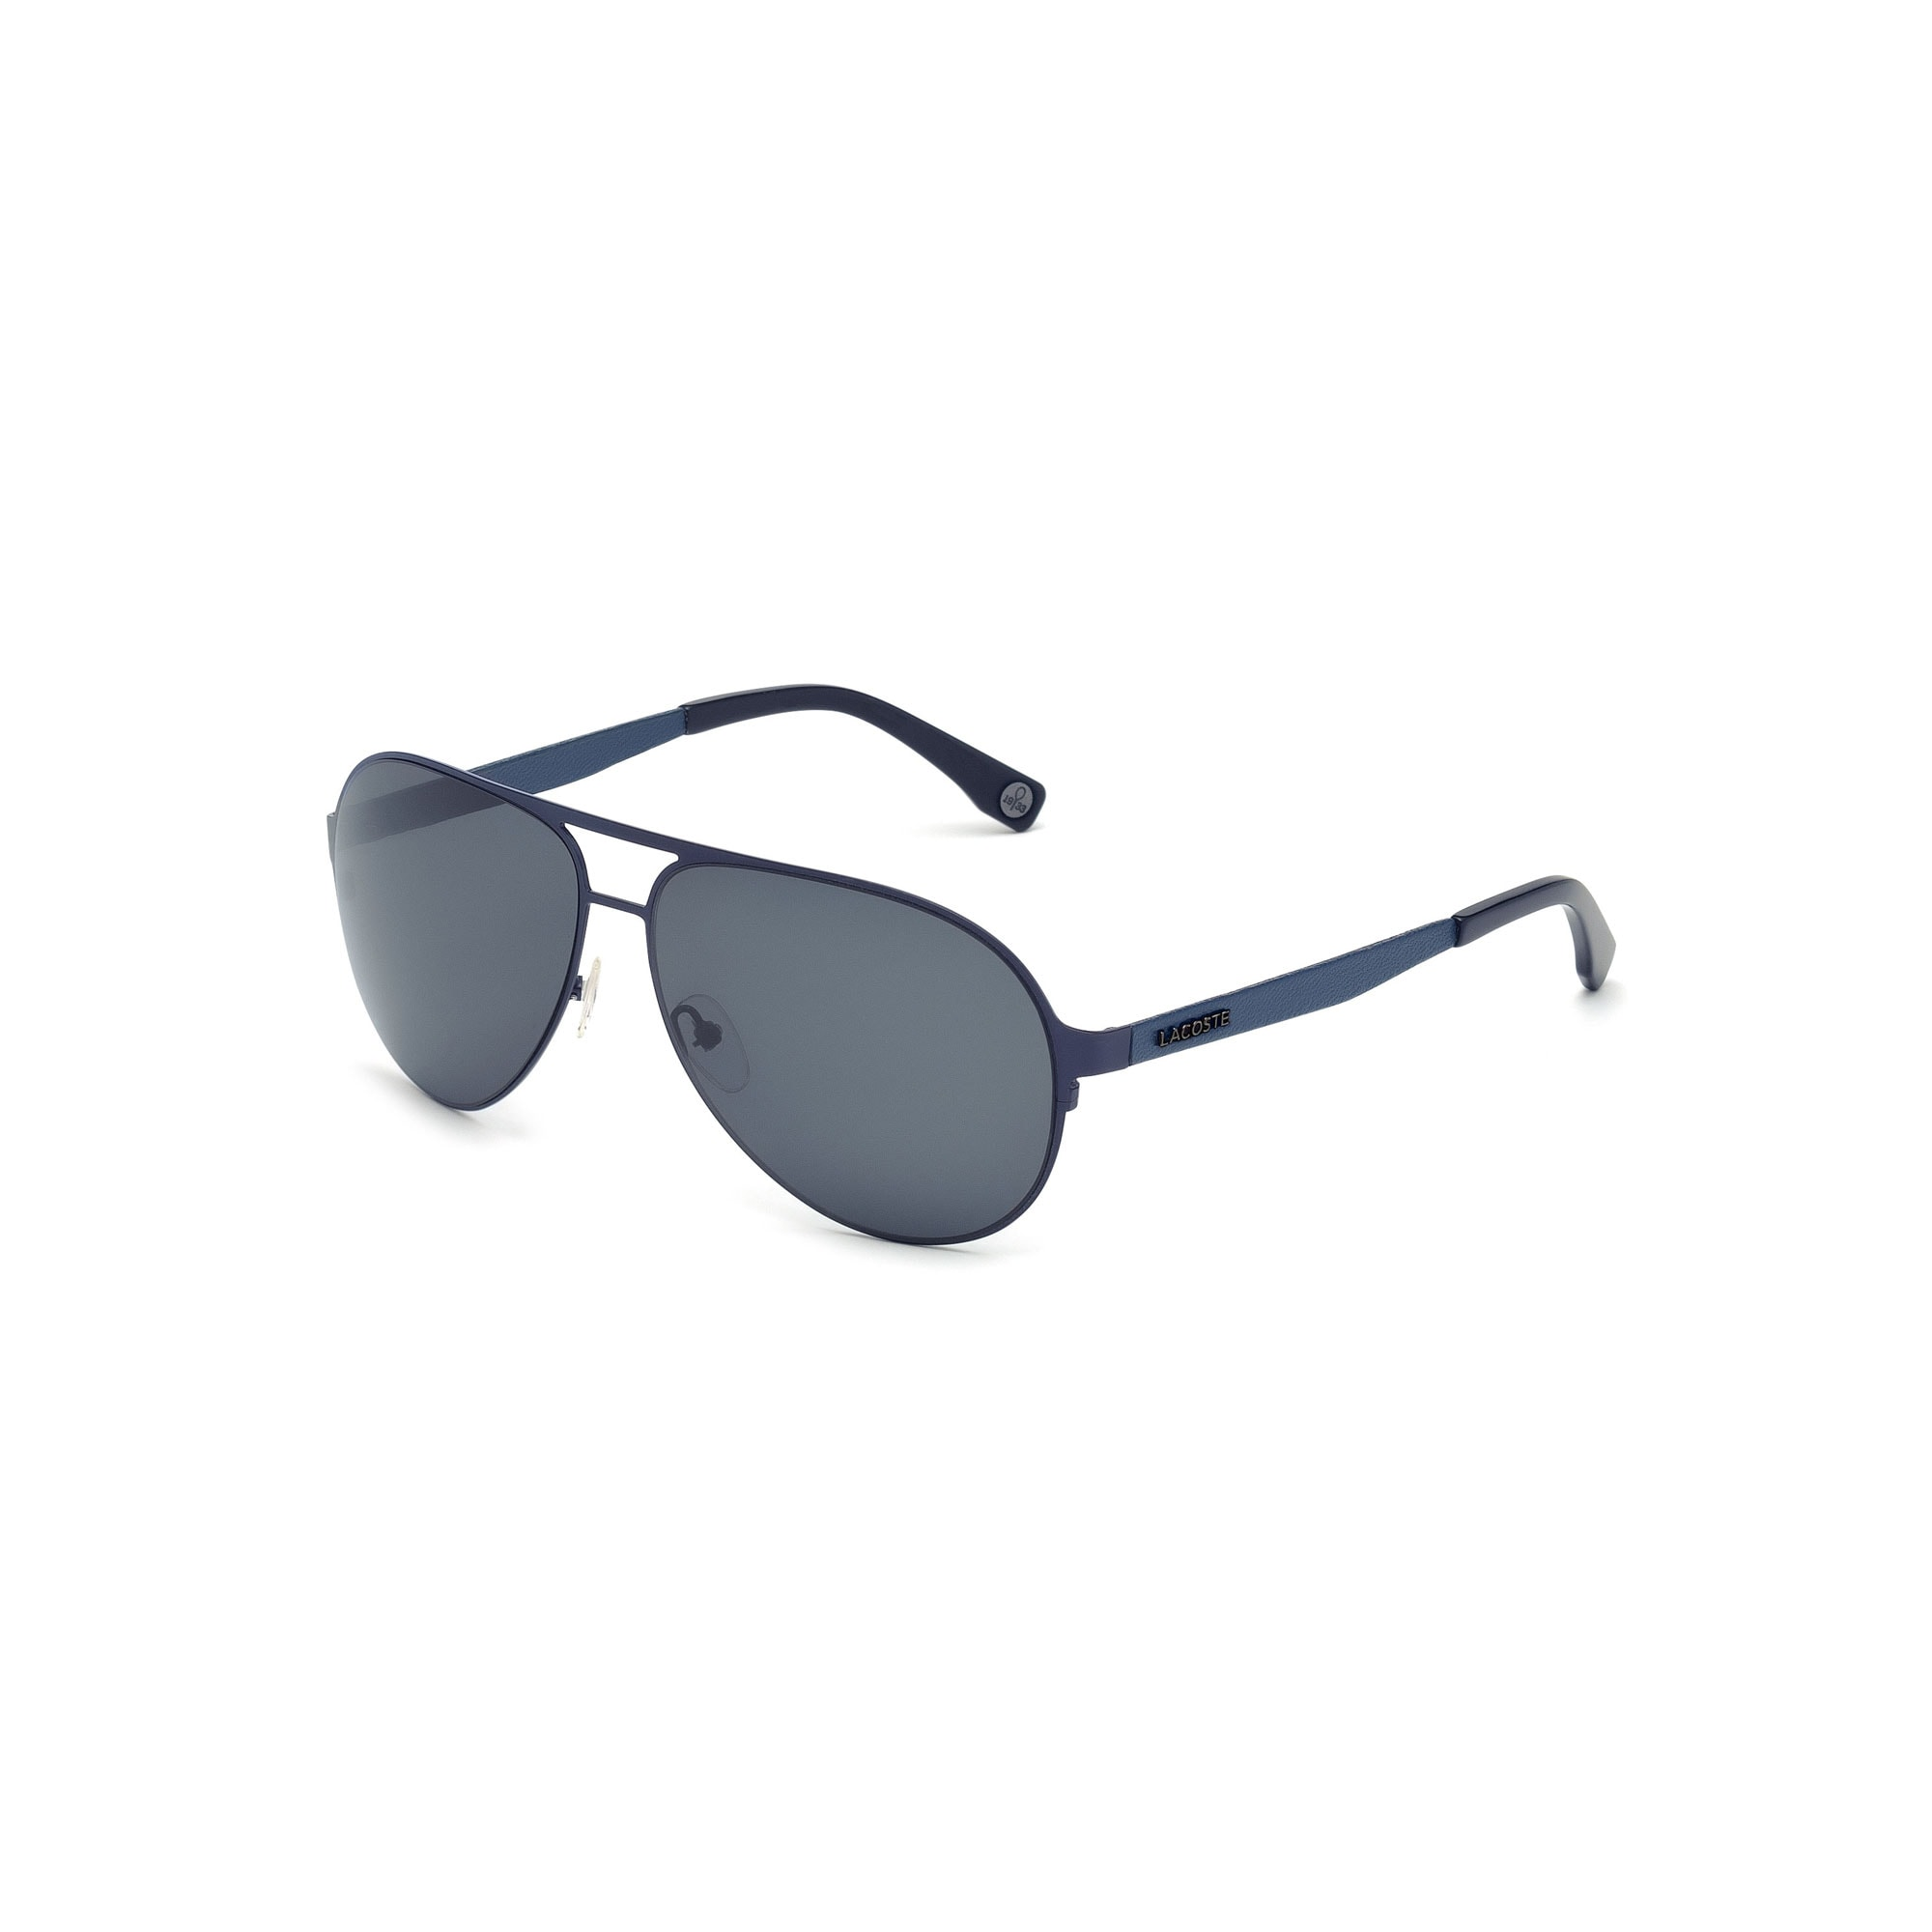 Sonnenbrille Kollektion Leder